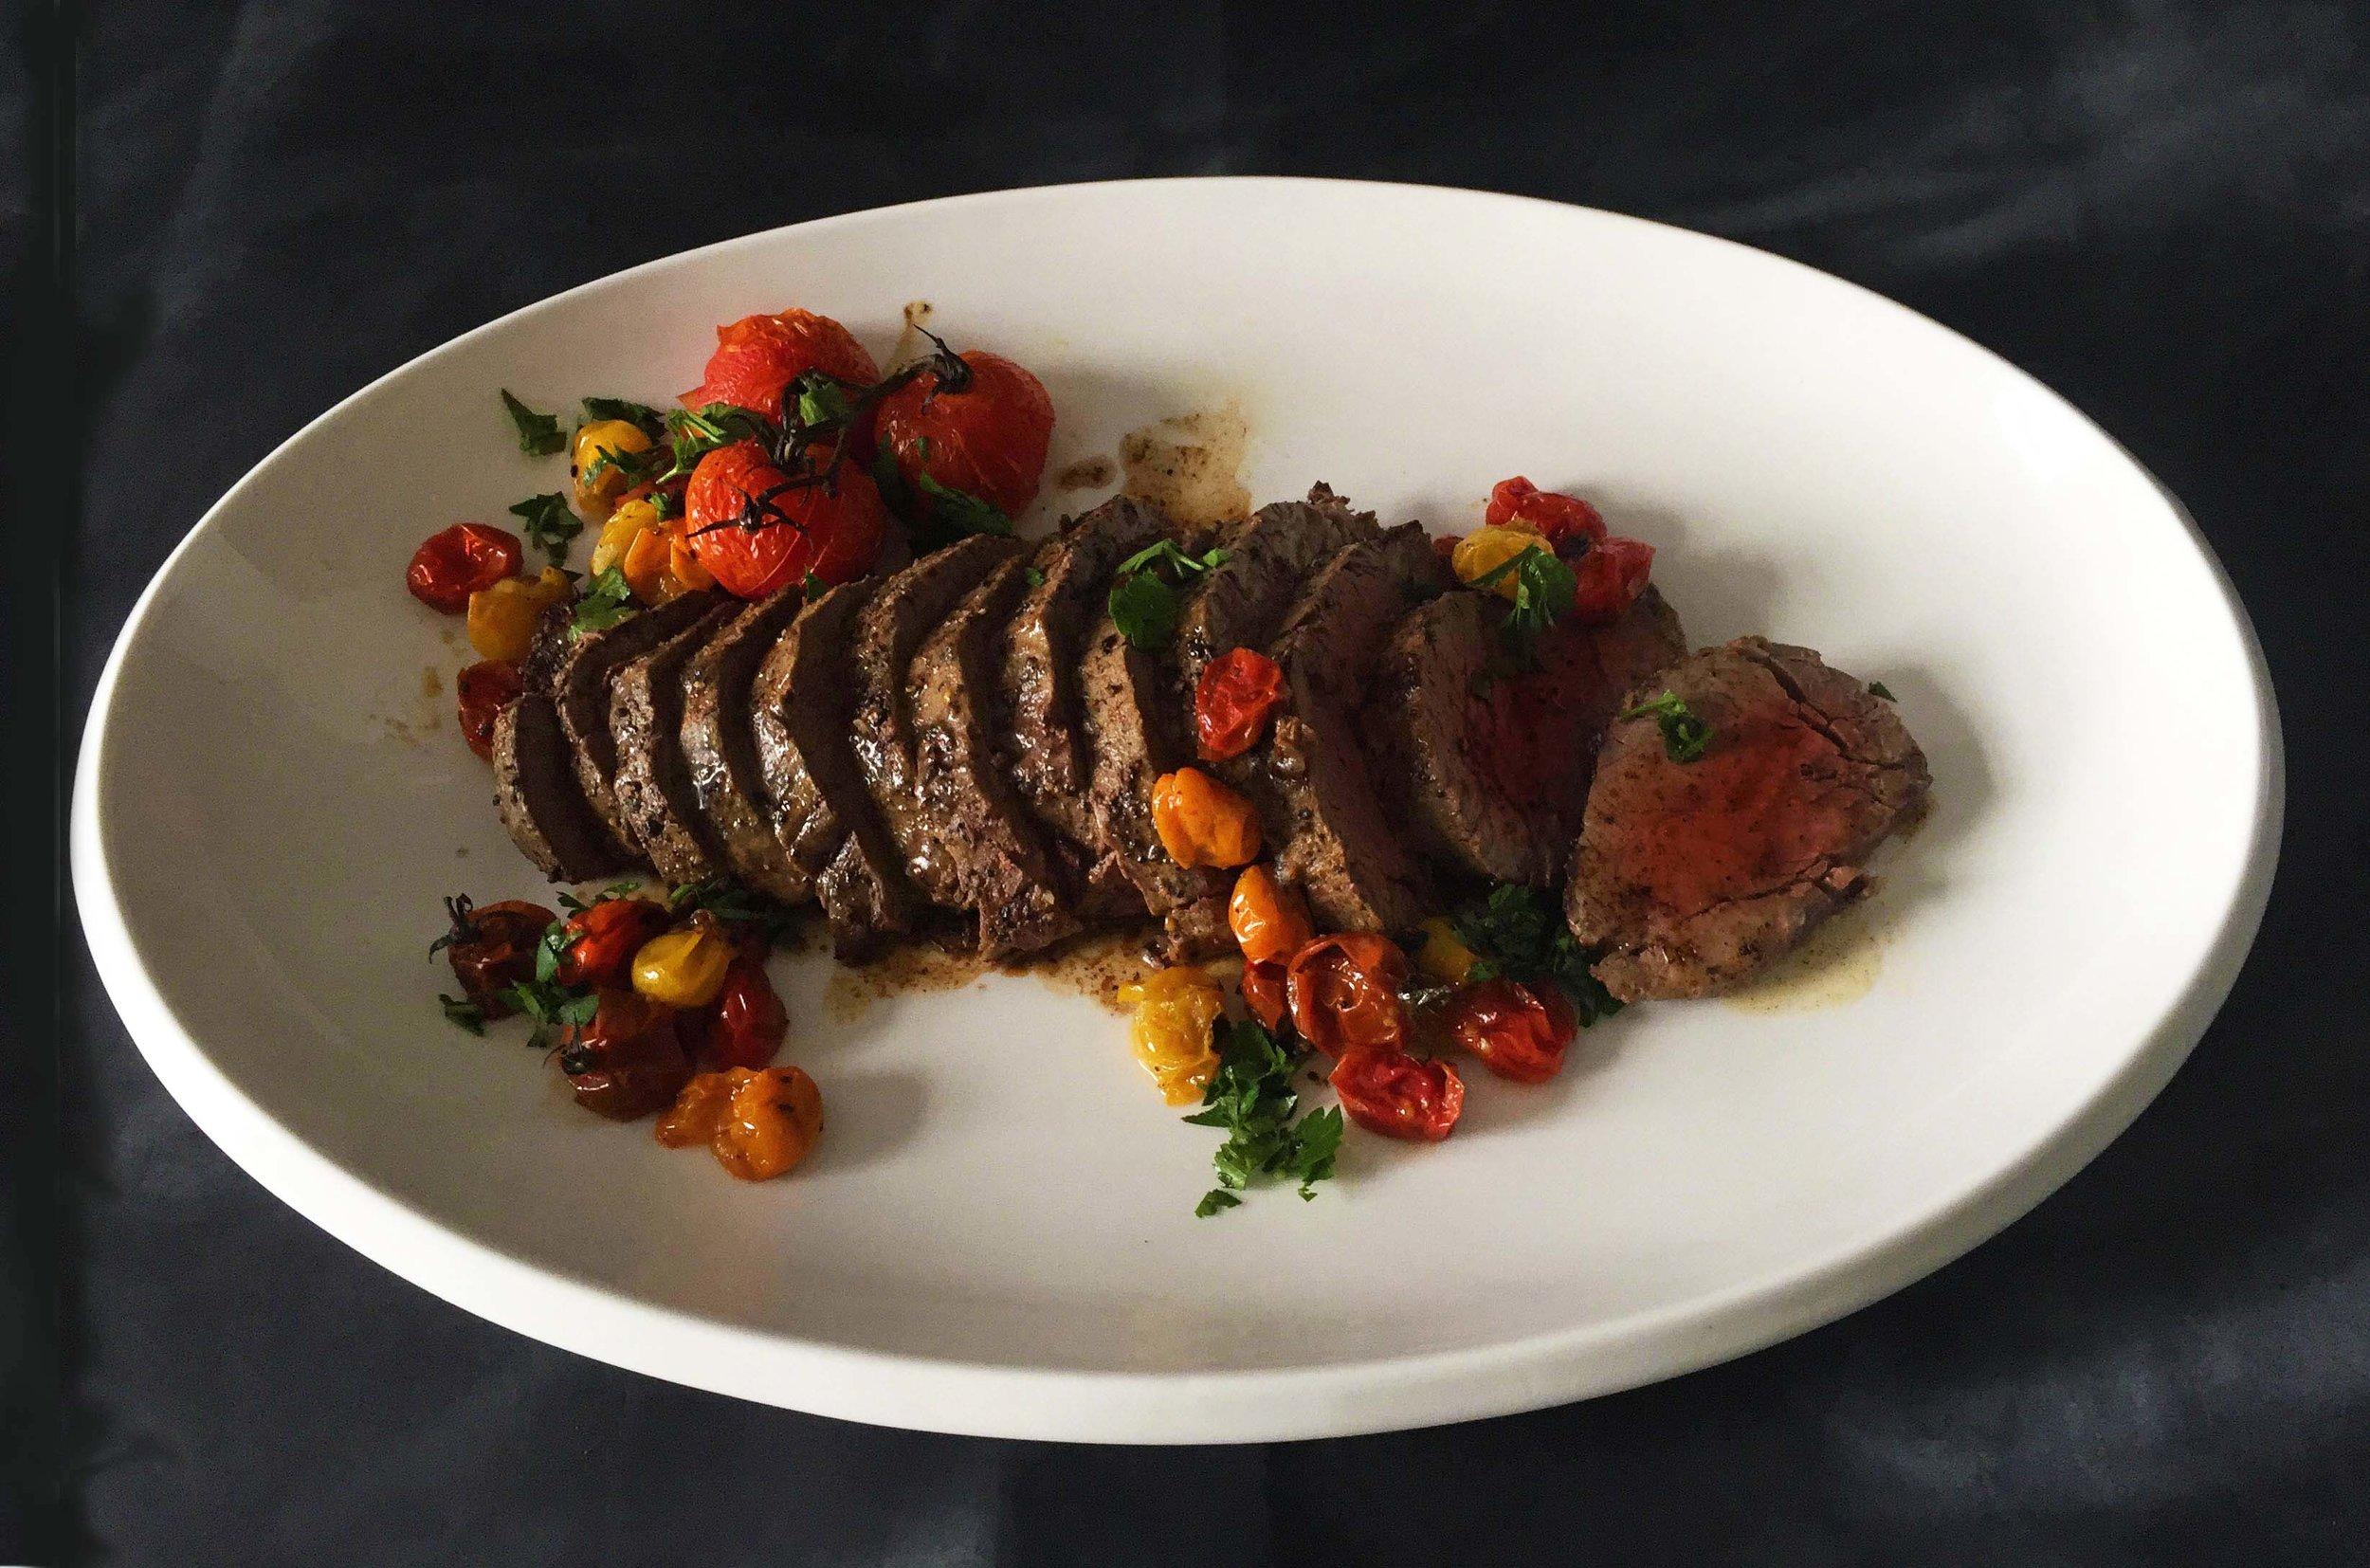 Beef Tenderloin for your holiday festivities